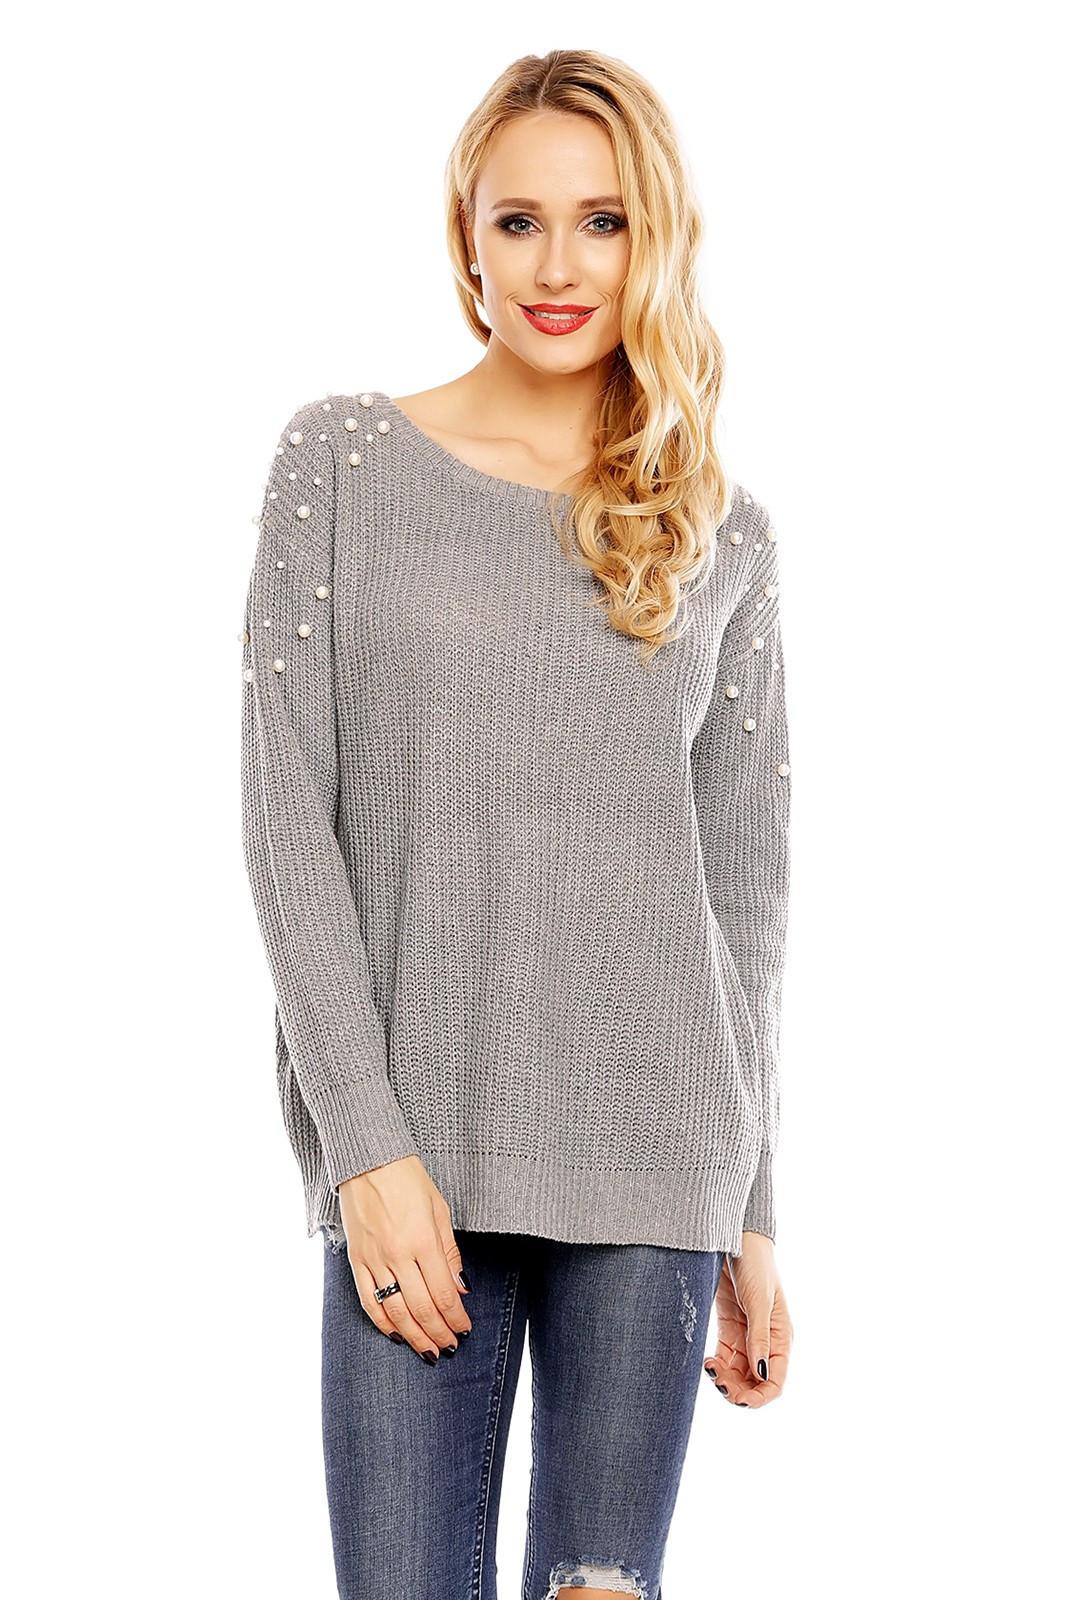 Dámsky sveter s ozdobnými perličkami sivý - sivé / UNI - House Style šedá UNI